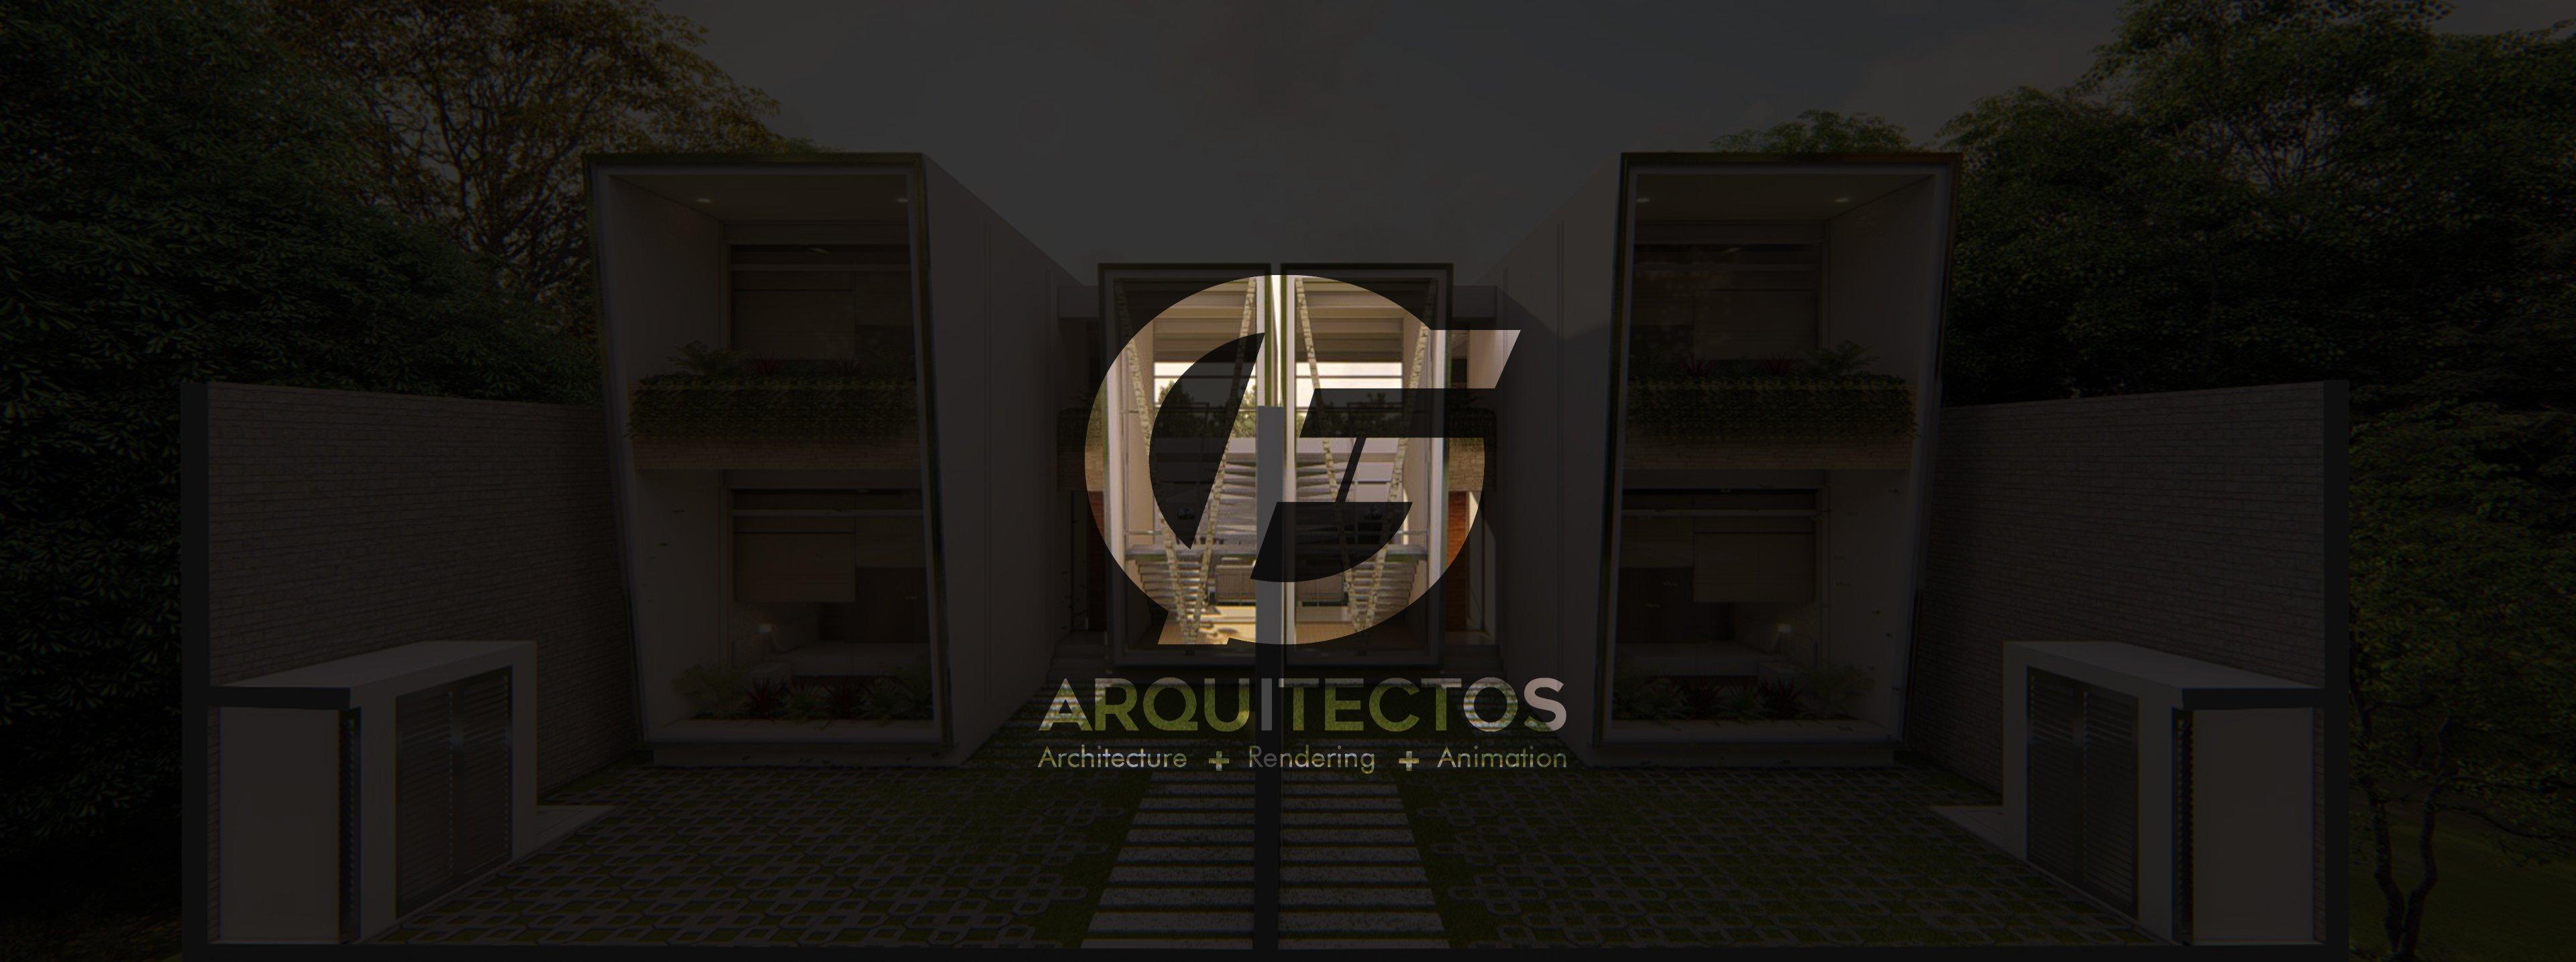 Gfive Arquitectos